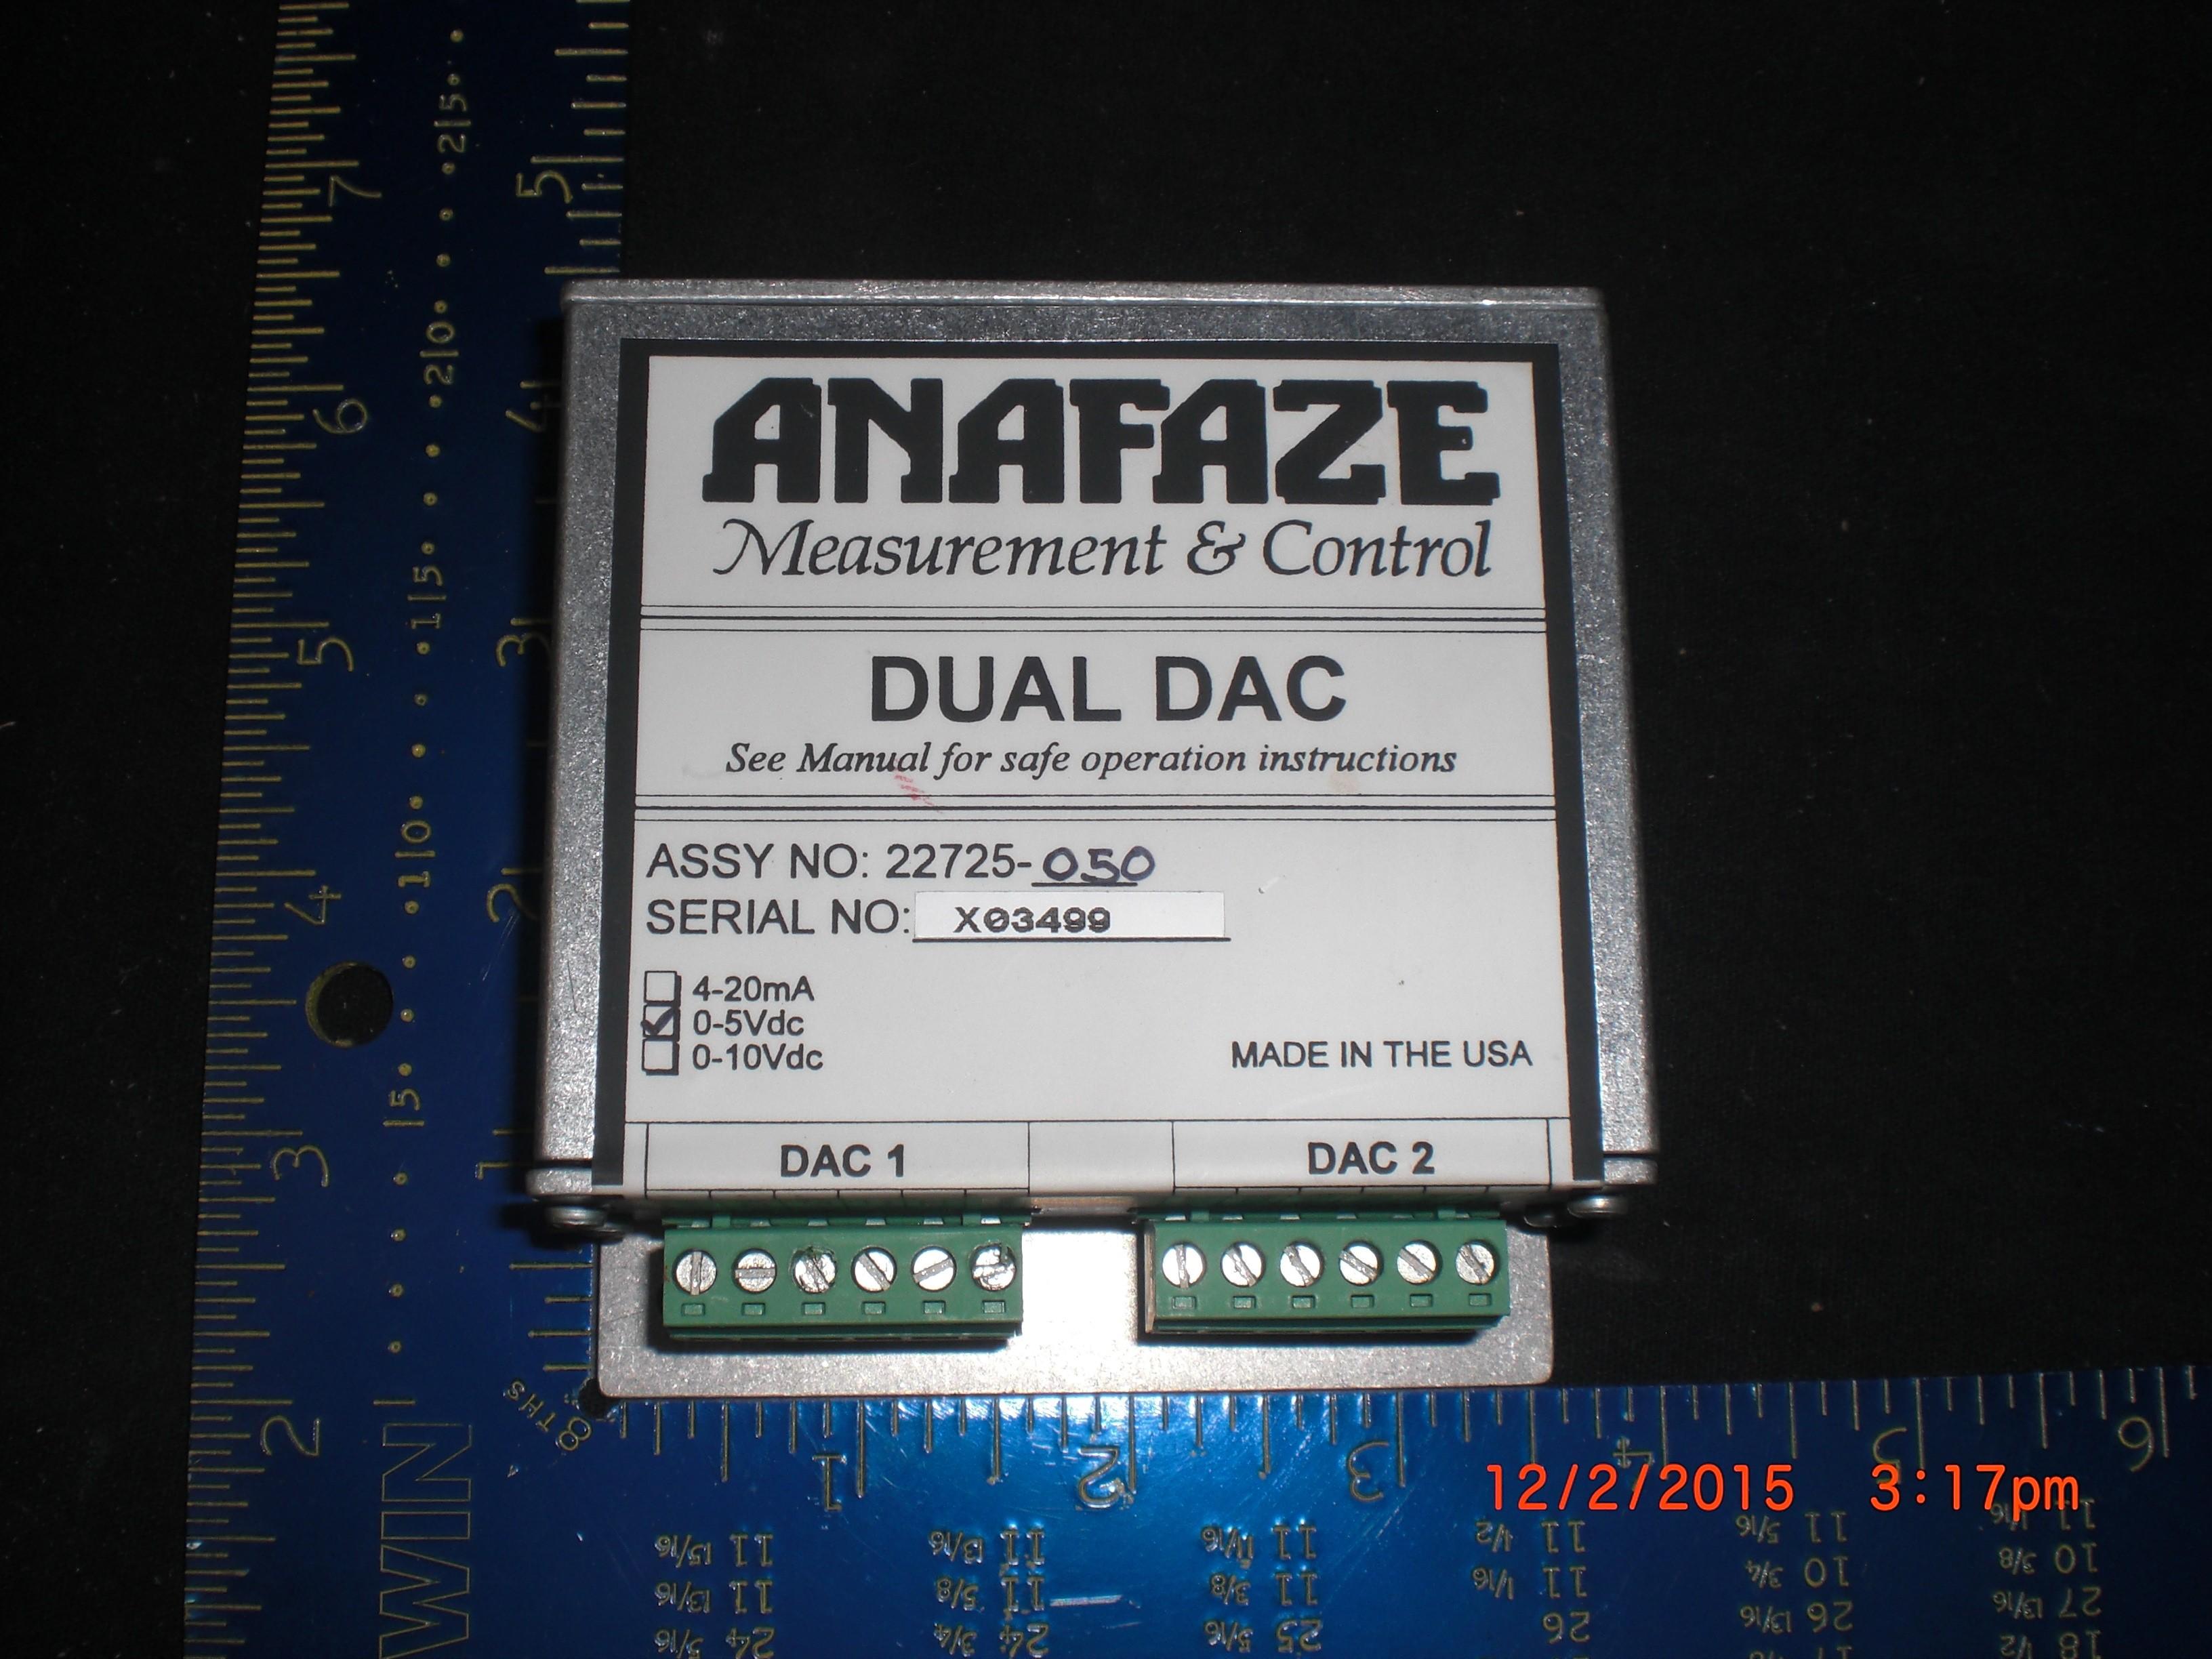 Instrument WATLOW 22725-050 Anafaze Dual DAC Transmitter